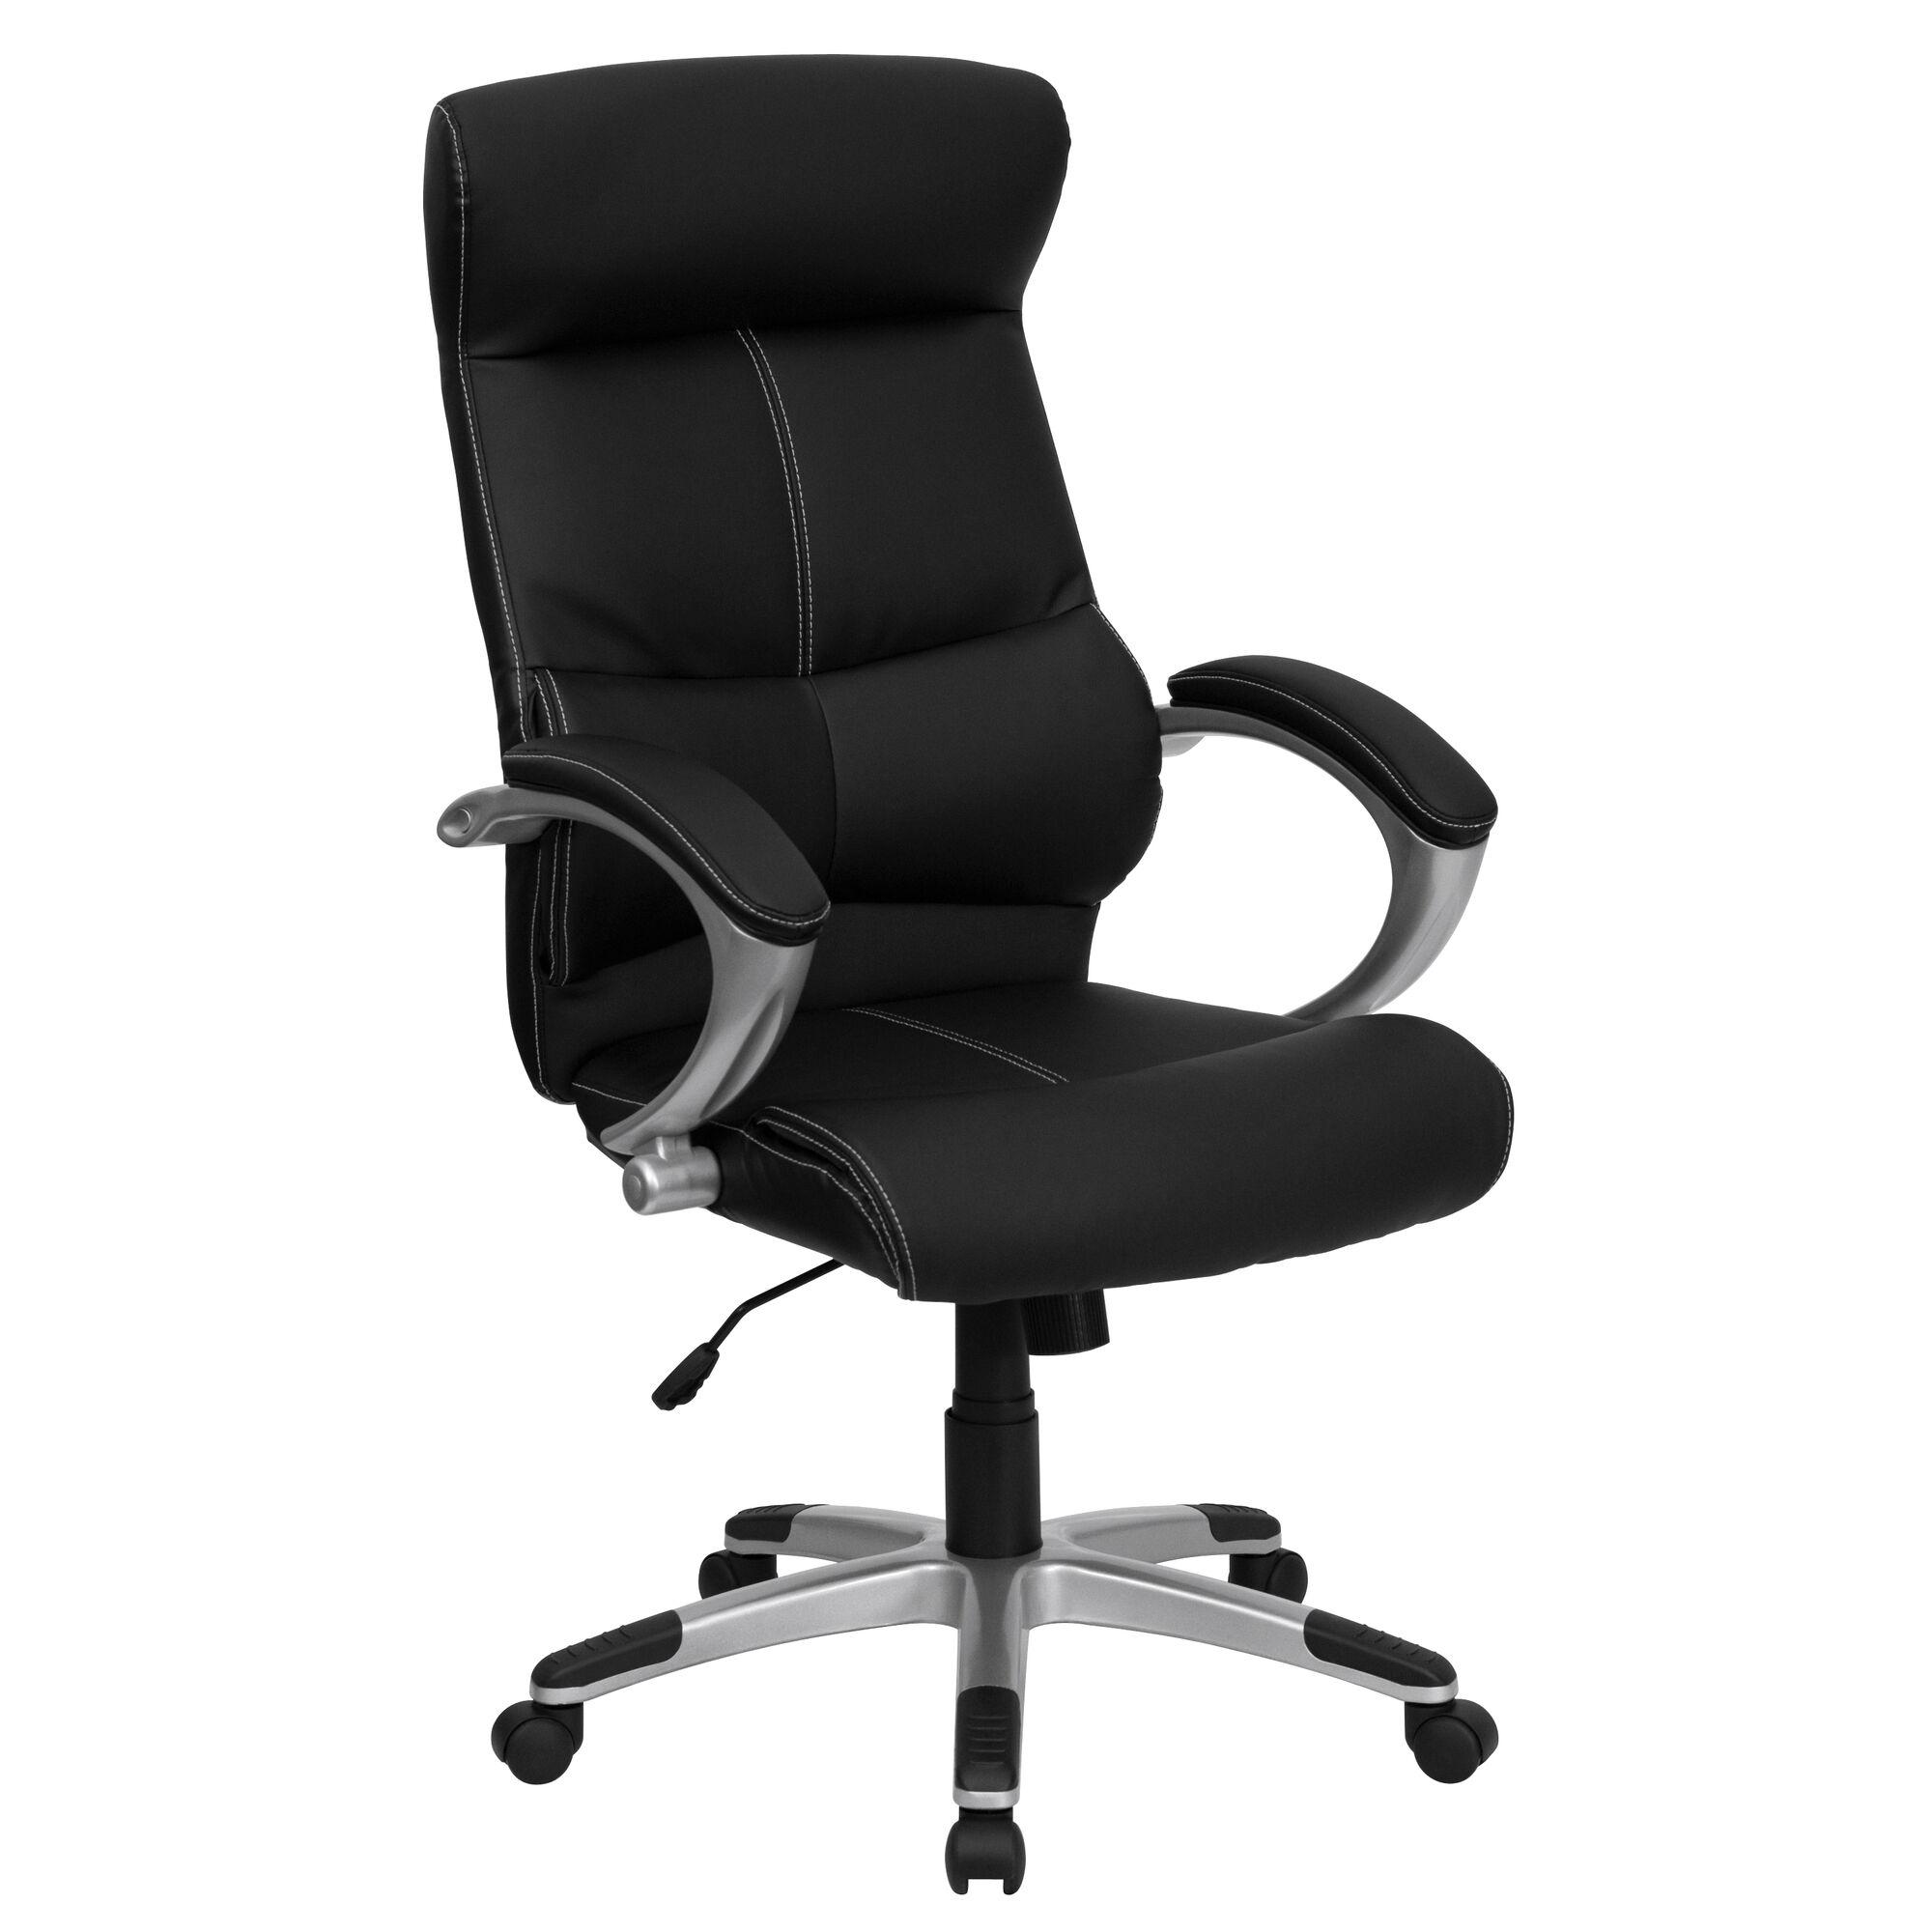 Flash furniture h 9637l 1c high gg for H furniture ww chair